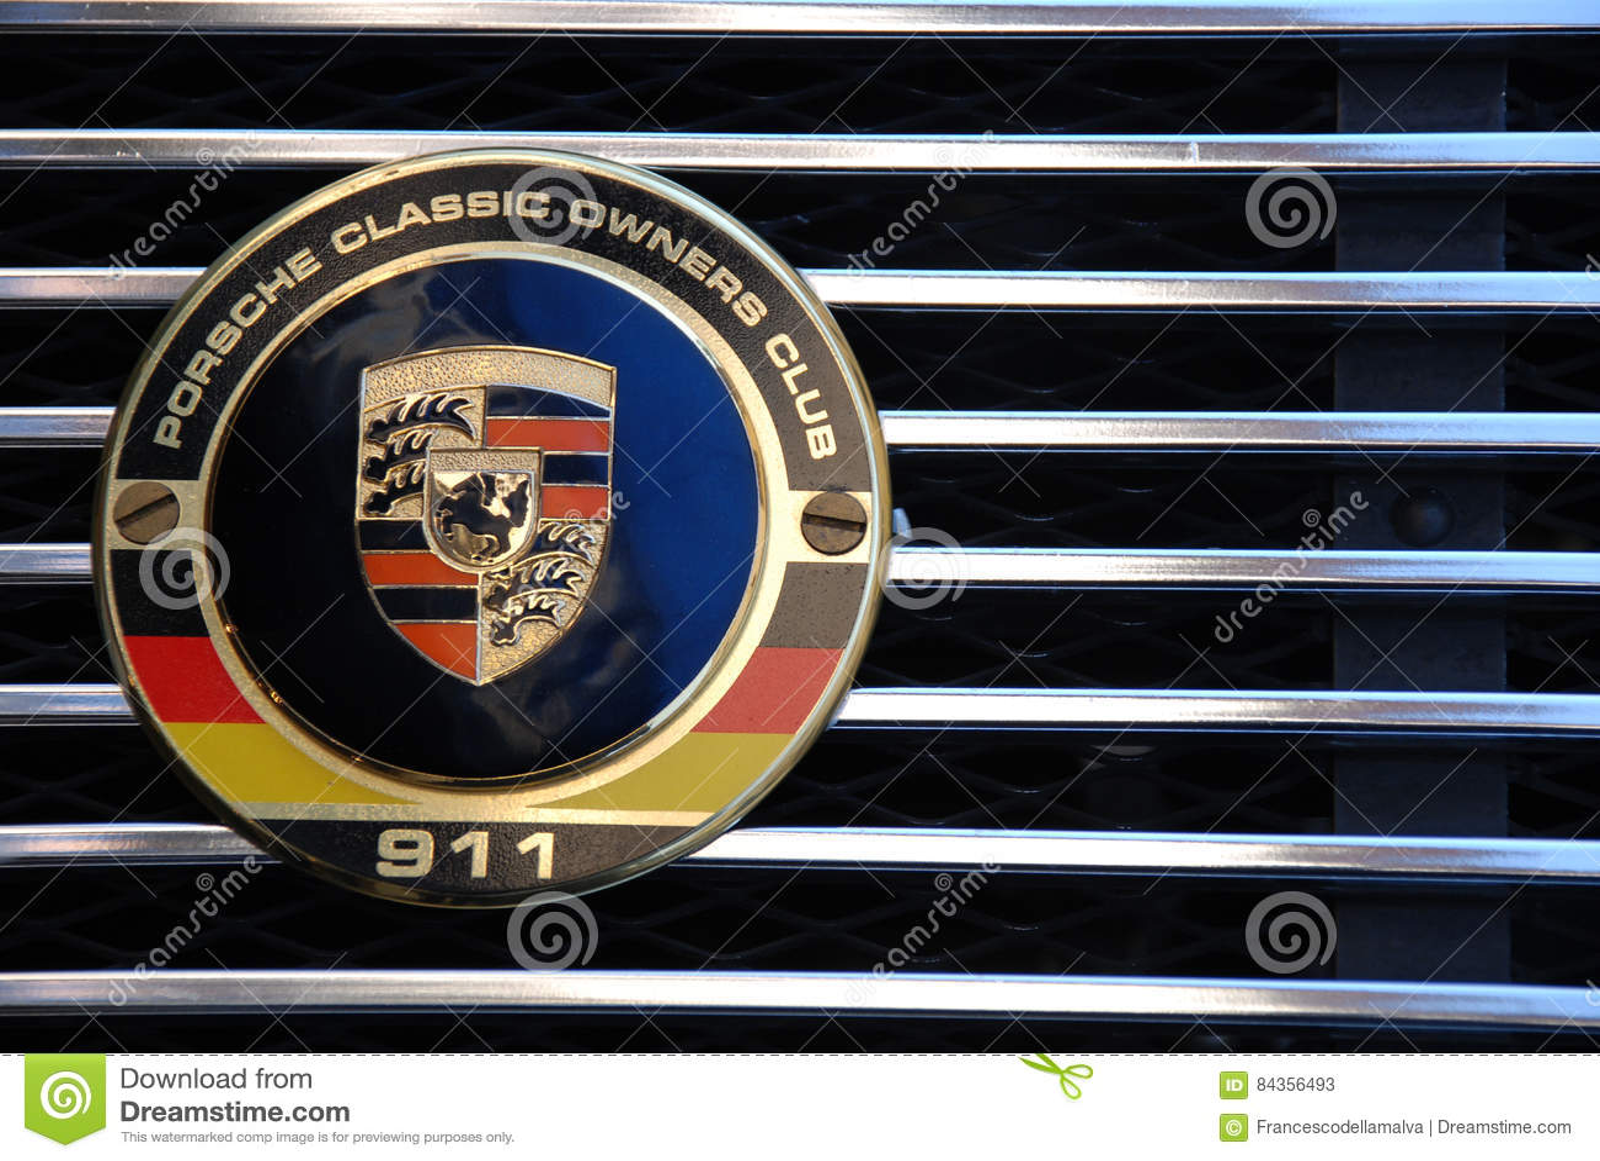 Porsche 911 logo detail editorial stock photo  Image of